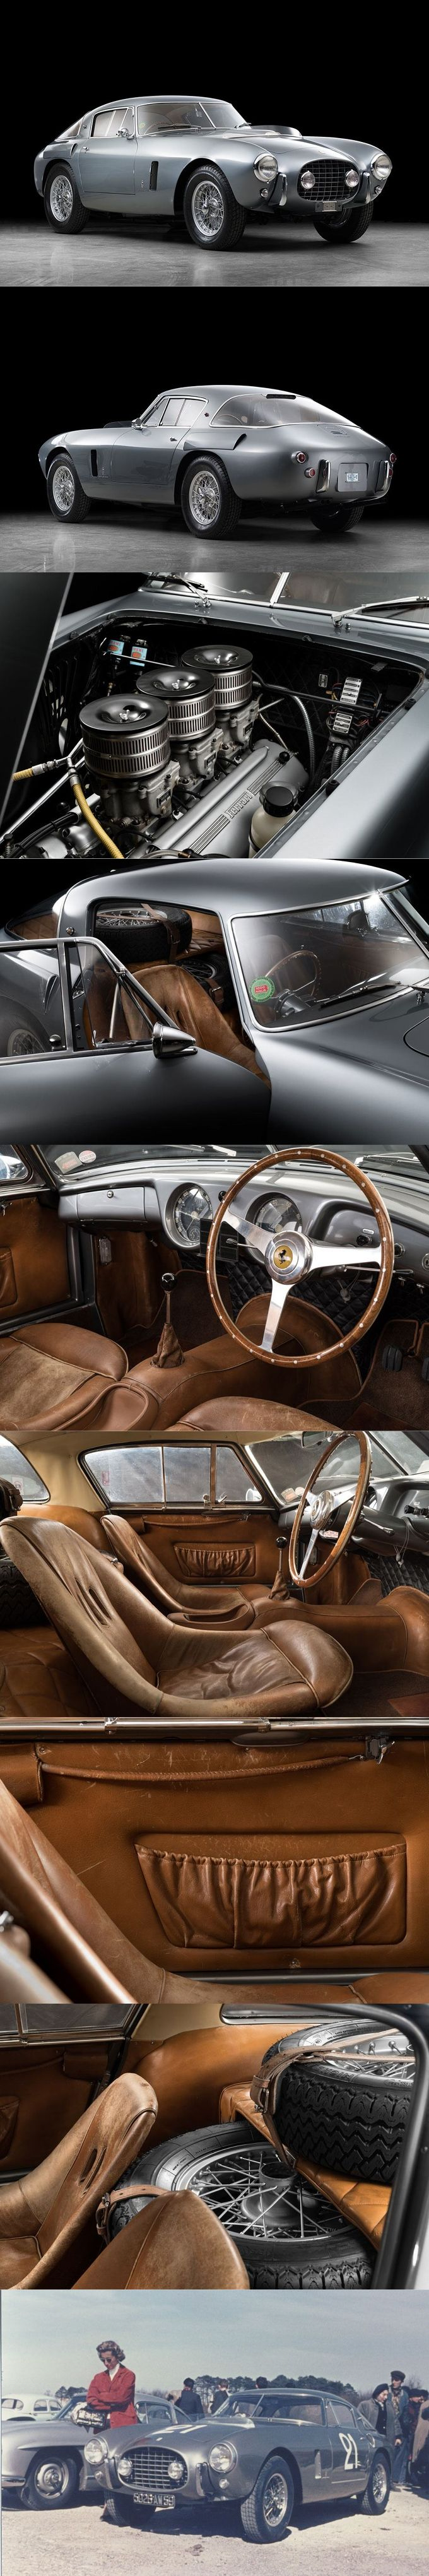 1952 Ferrari 250 MM / s/n 0310MM / classicdriver.com / Vignale / Italy / silver